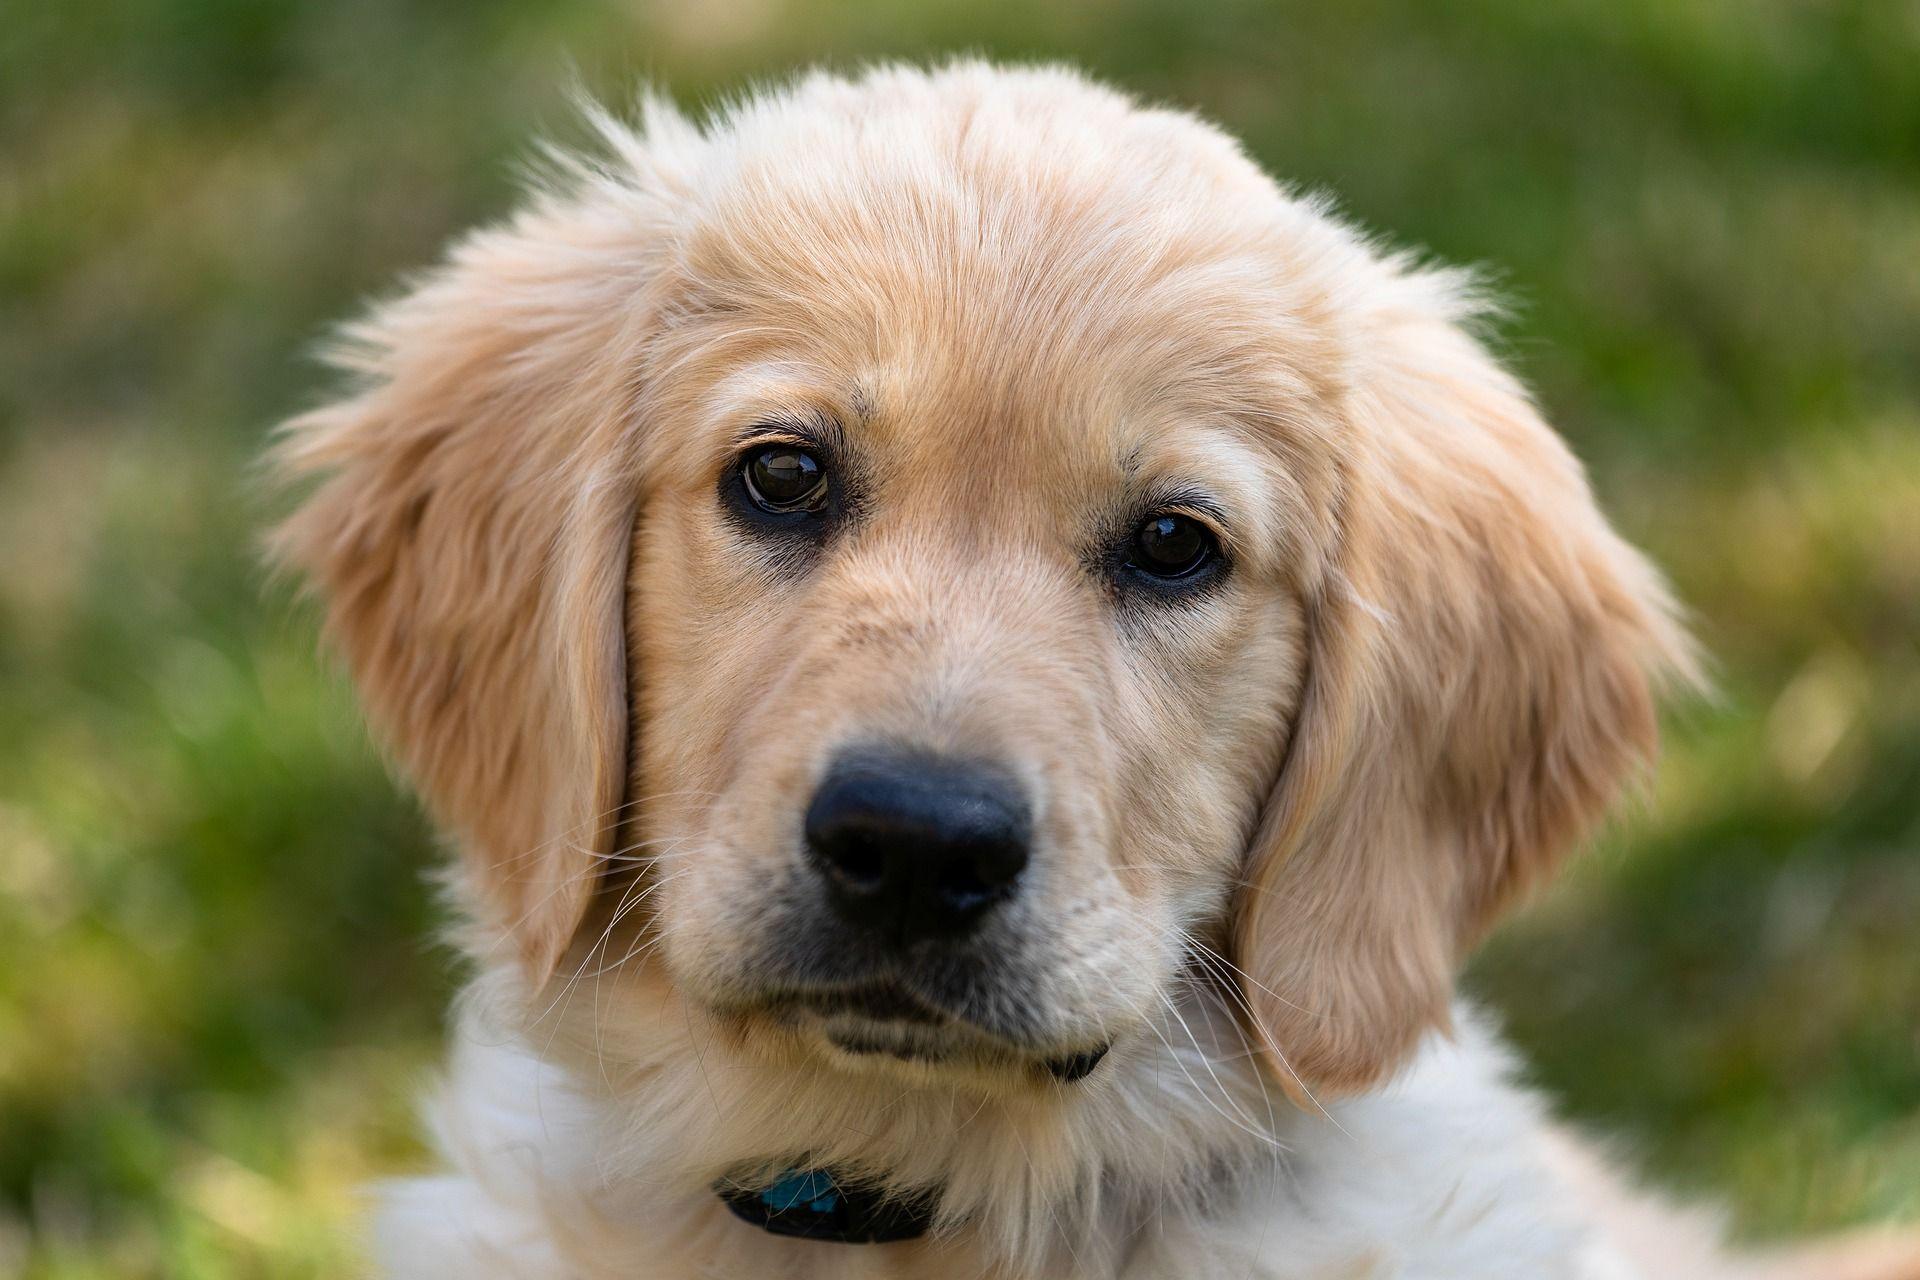 Golden Retriever Puppy Dogs Golden Retriever Dog Daycare Buy